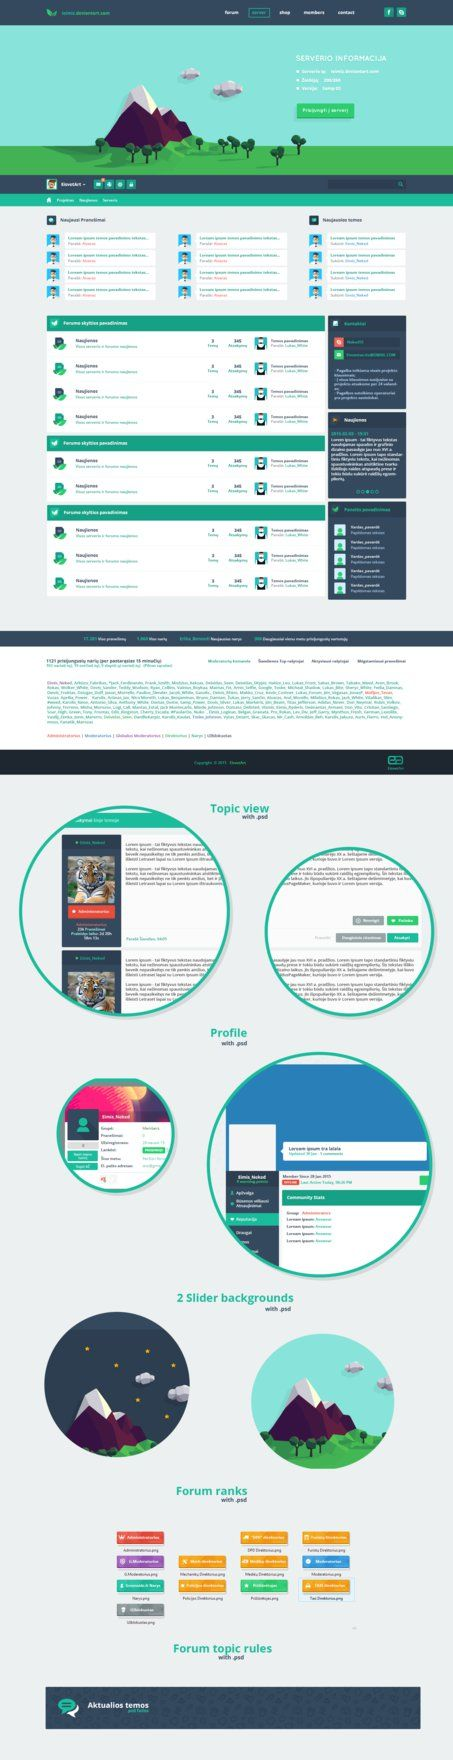 [ FREE ] Samp flat web design by iEimiz on DeviantArt